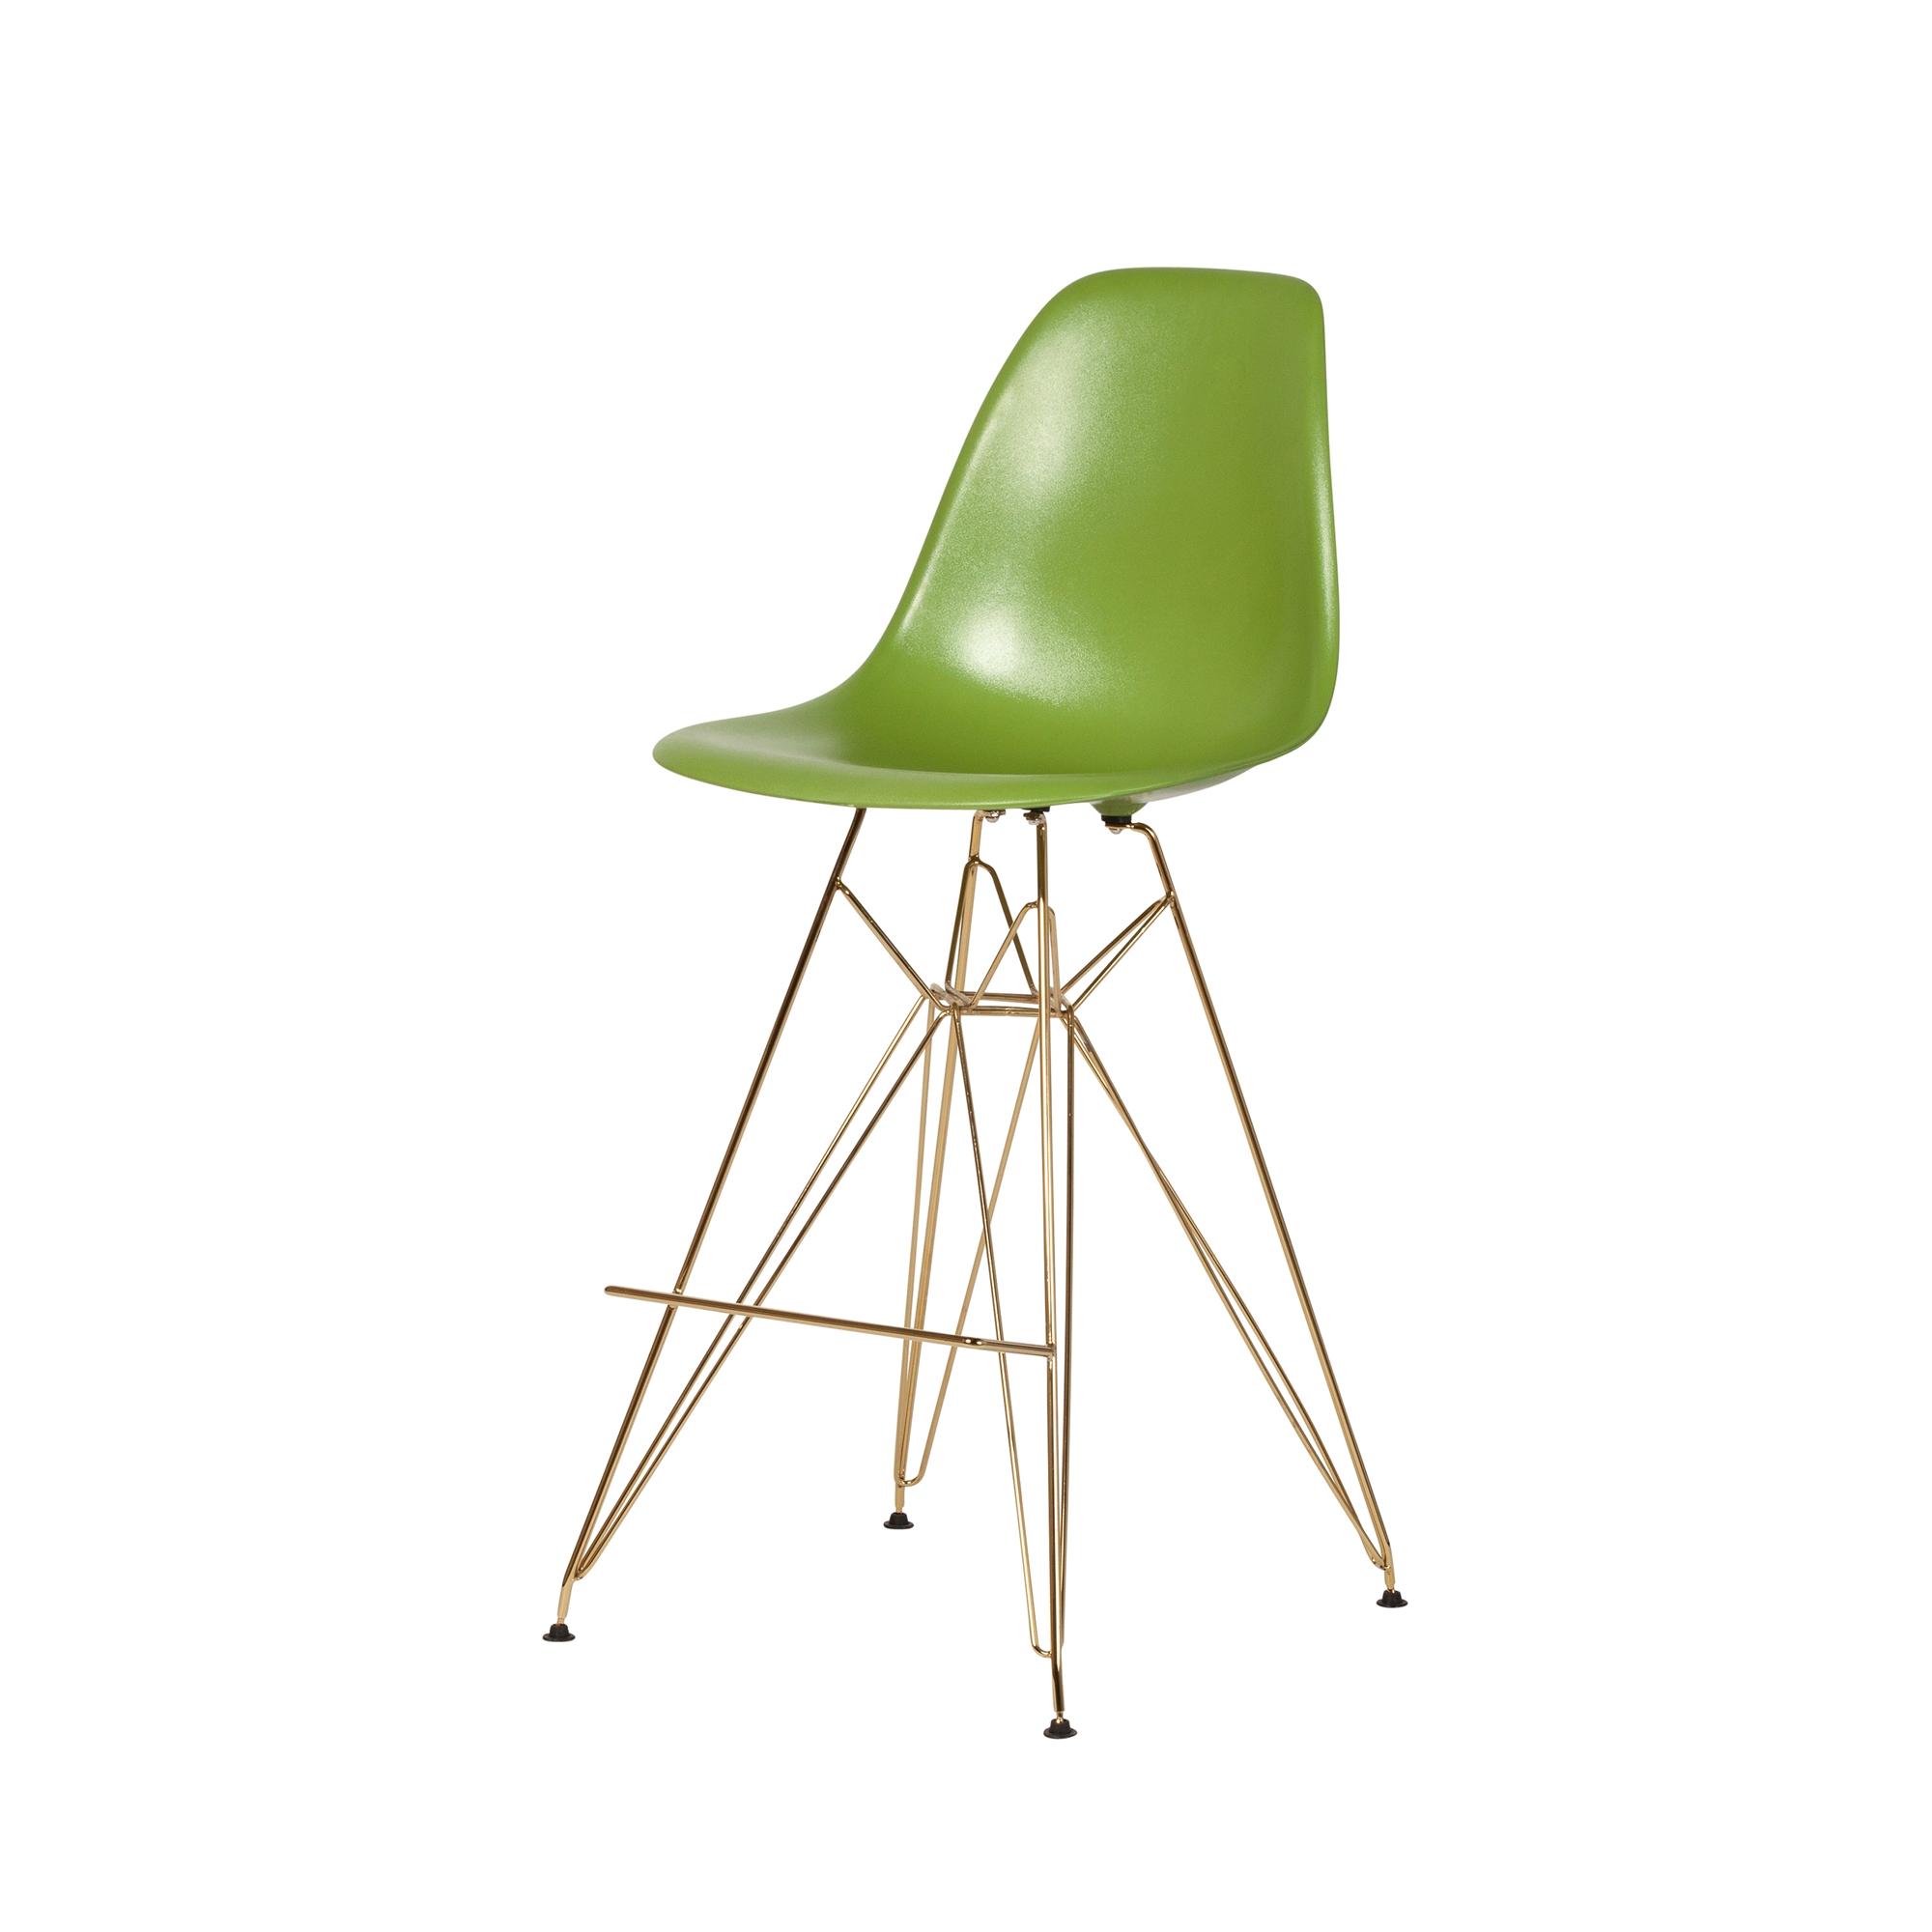 Prime Molded Acrylic Counter Stool Gold Finish Legs Lime Green Inzonedesignstudio Interior Chair Design Inzonedesignstudiocom